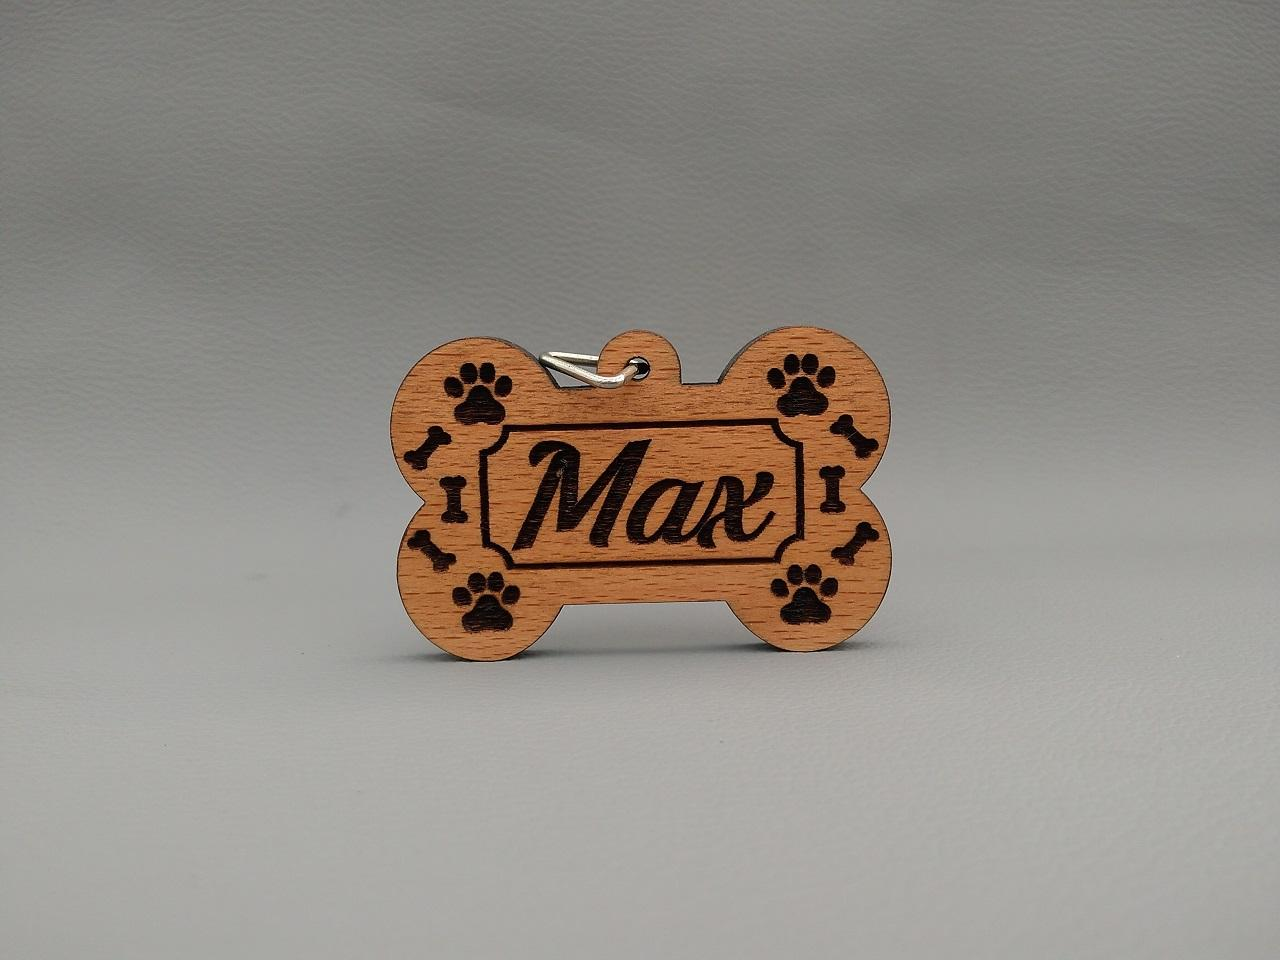 collar tag for dog!